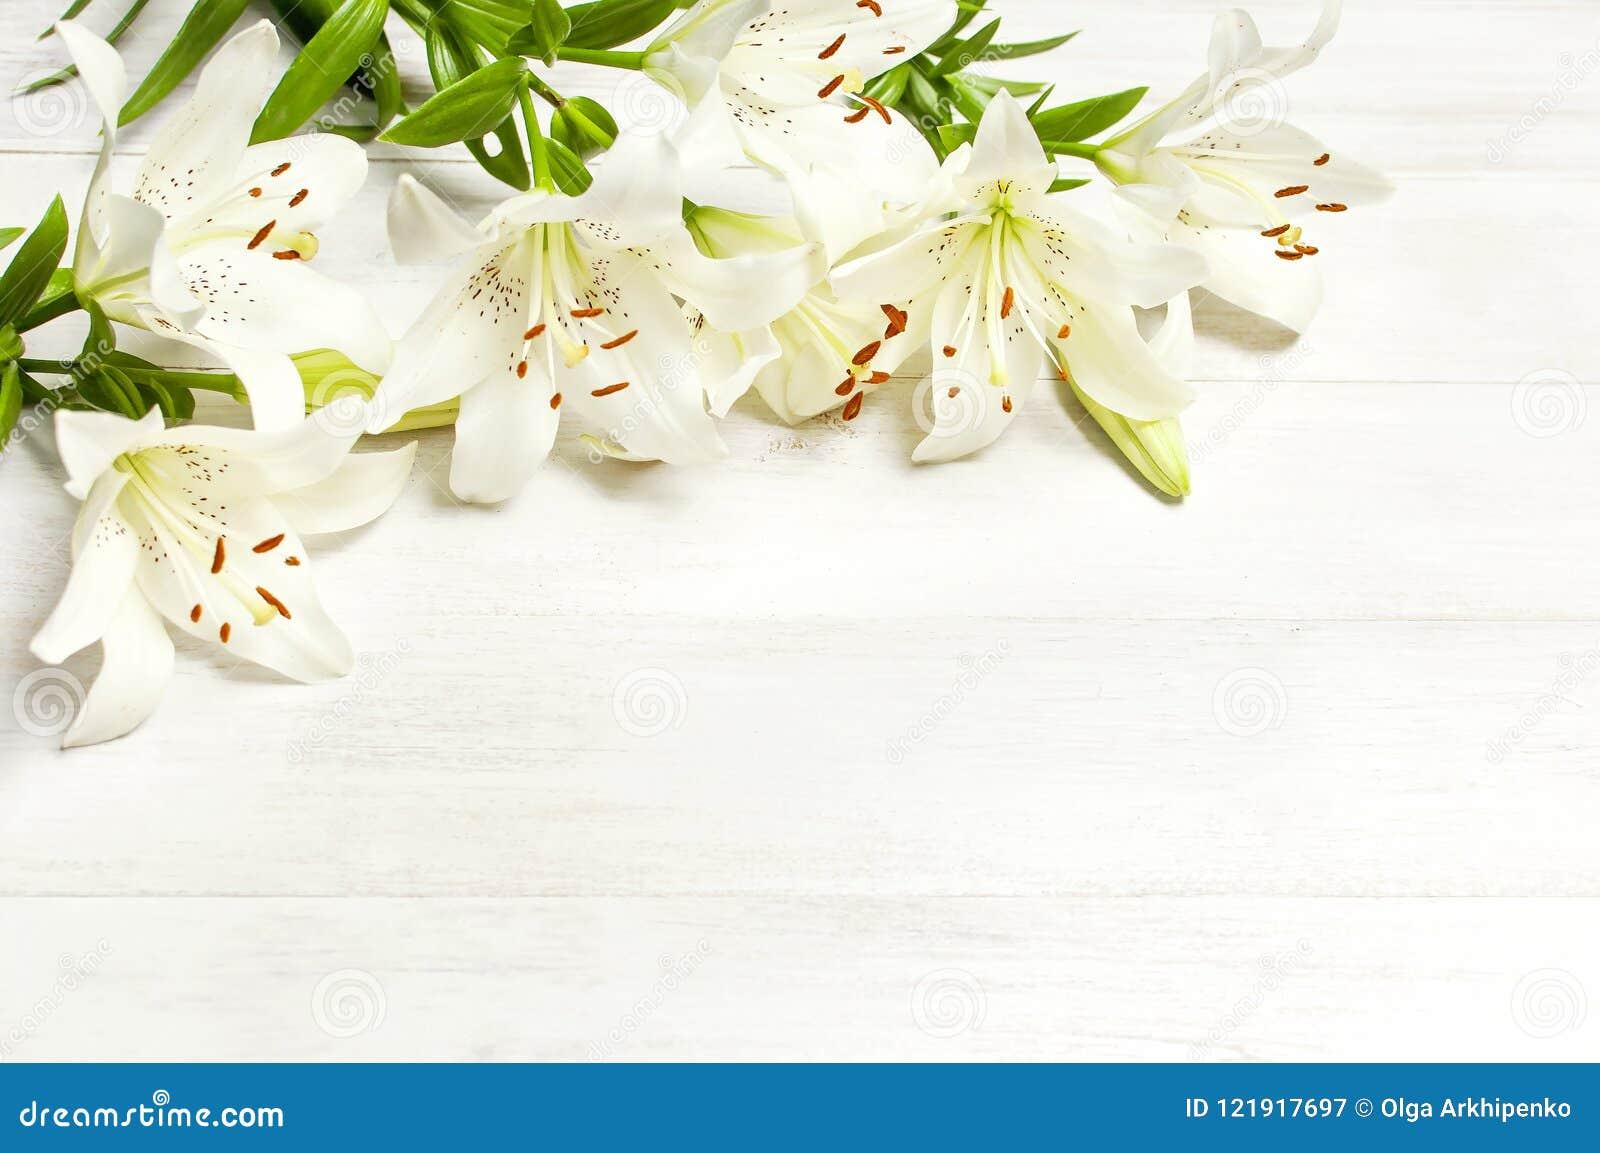 Frame of white lilies on a white wooden background top view flowers frame of white lilies on a white wooden background top view flowers lily beautiful bouquet izmirmasajfo